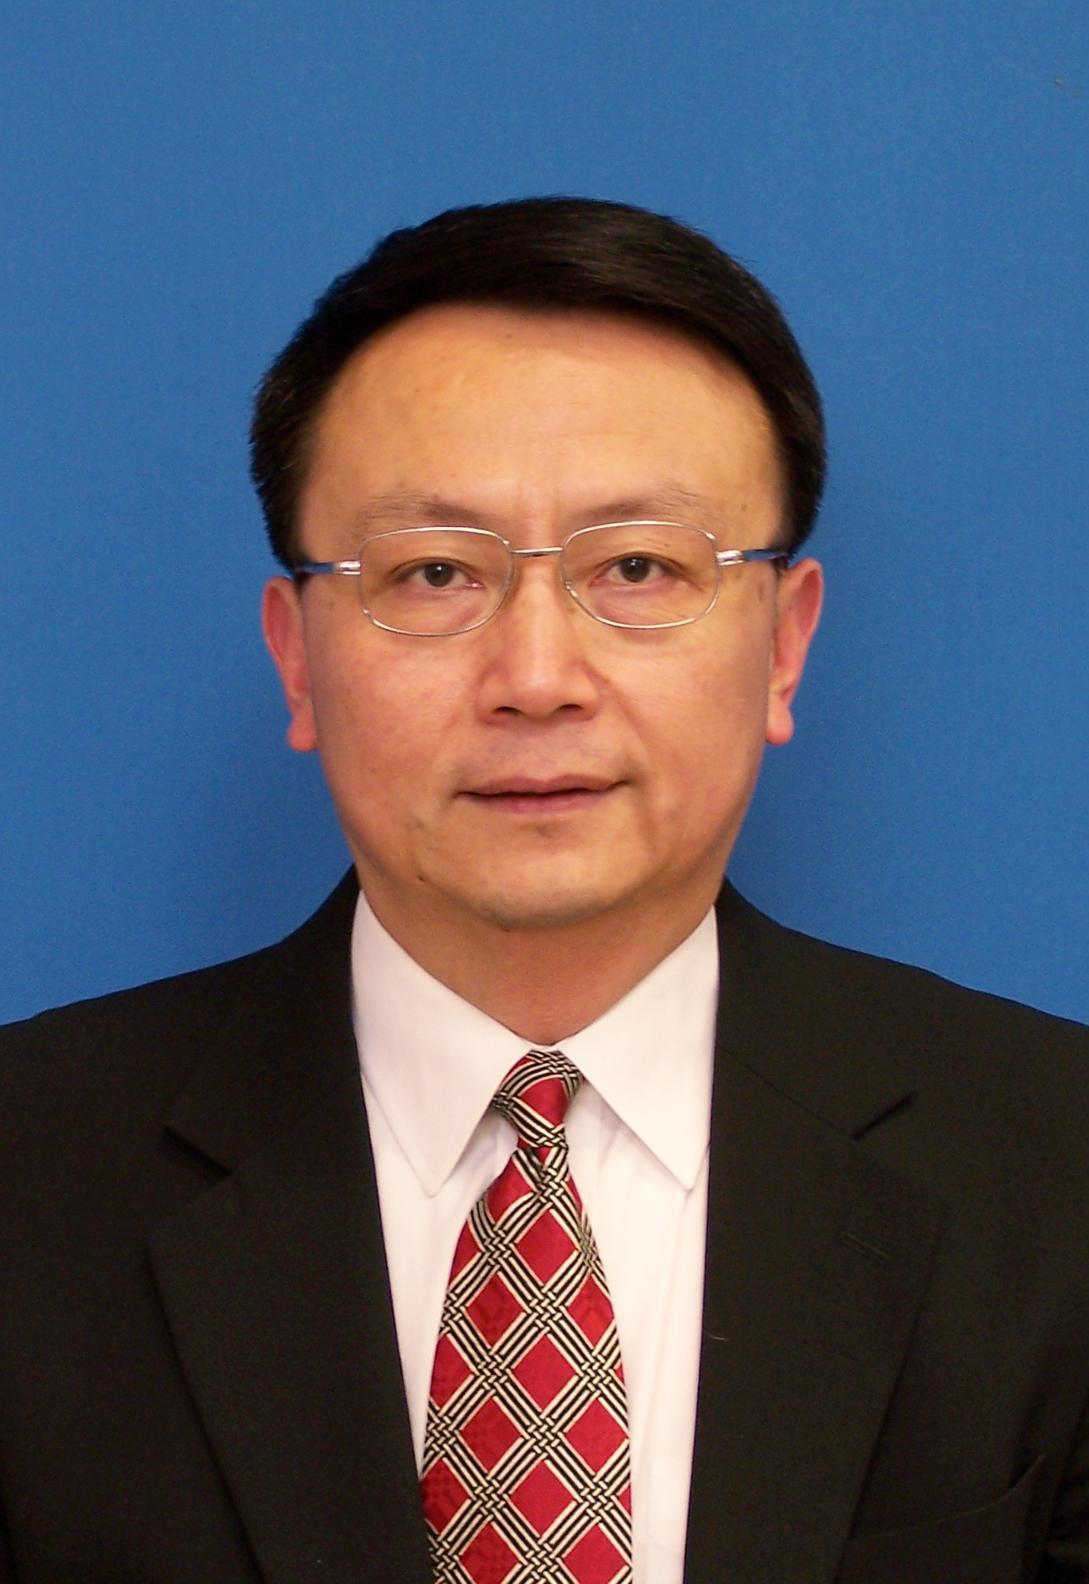 贾庆国照片